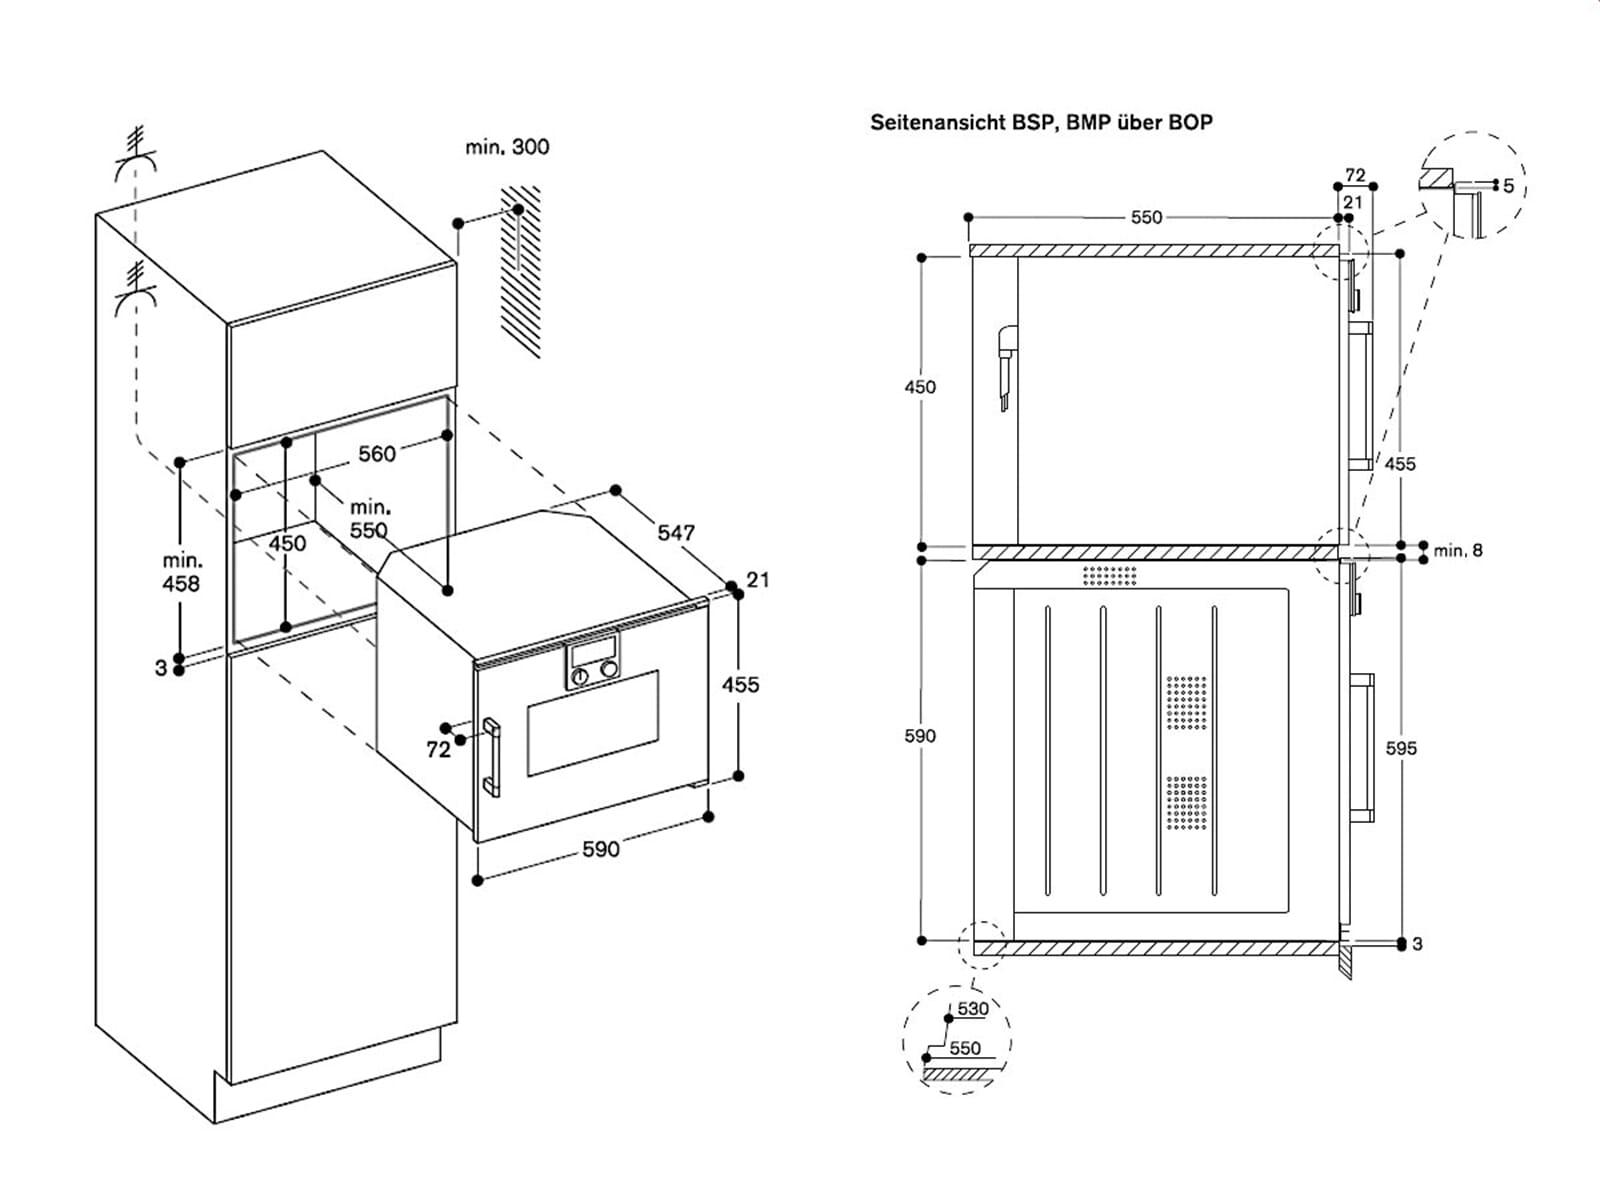 Gaggenau BSP 221 110 Kompakt Dampfgarer Serie 200 Metallic